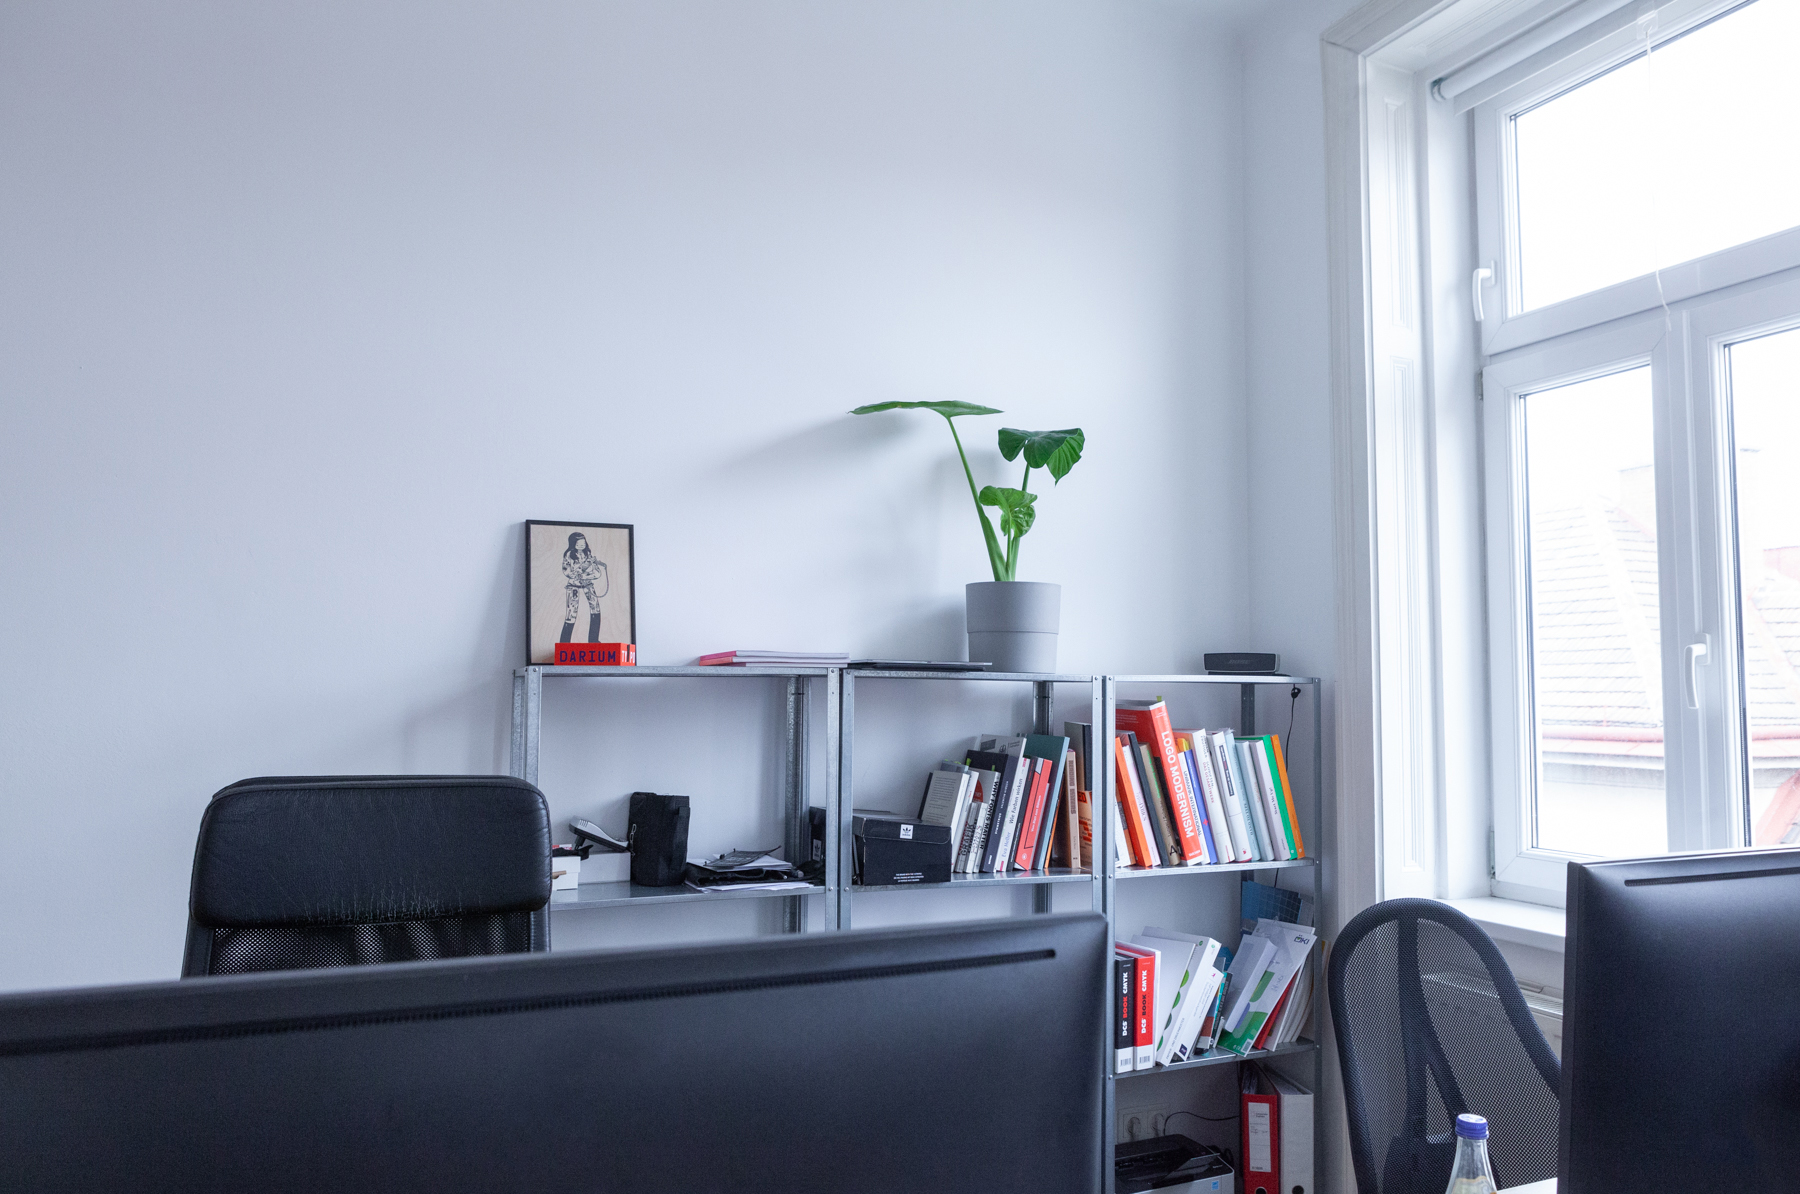 Büro | Grafik und Webdev | Wiesengasse 27, 1090